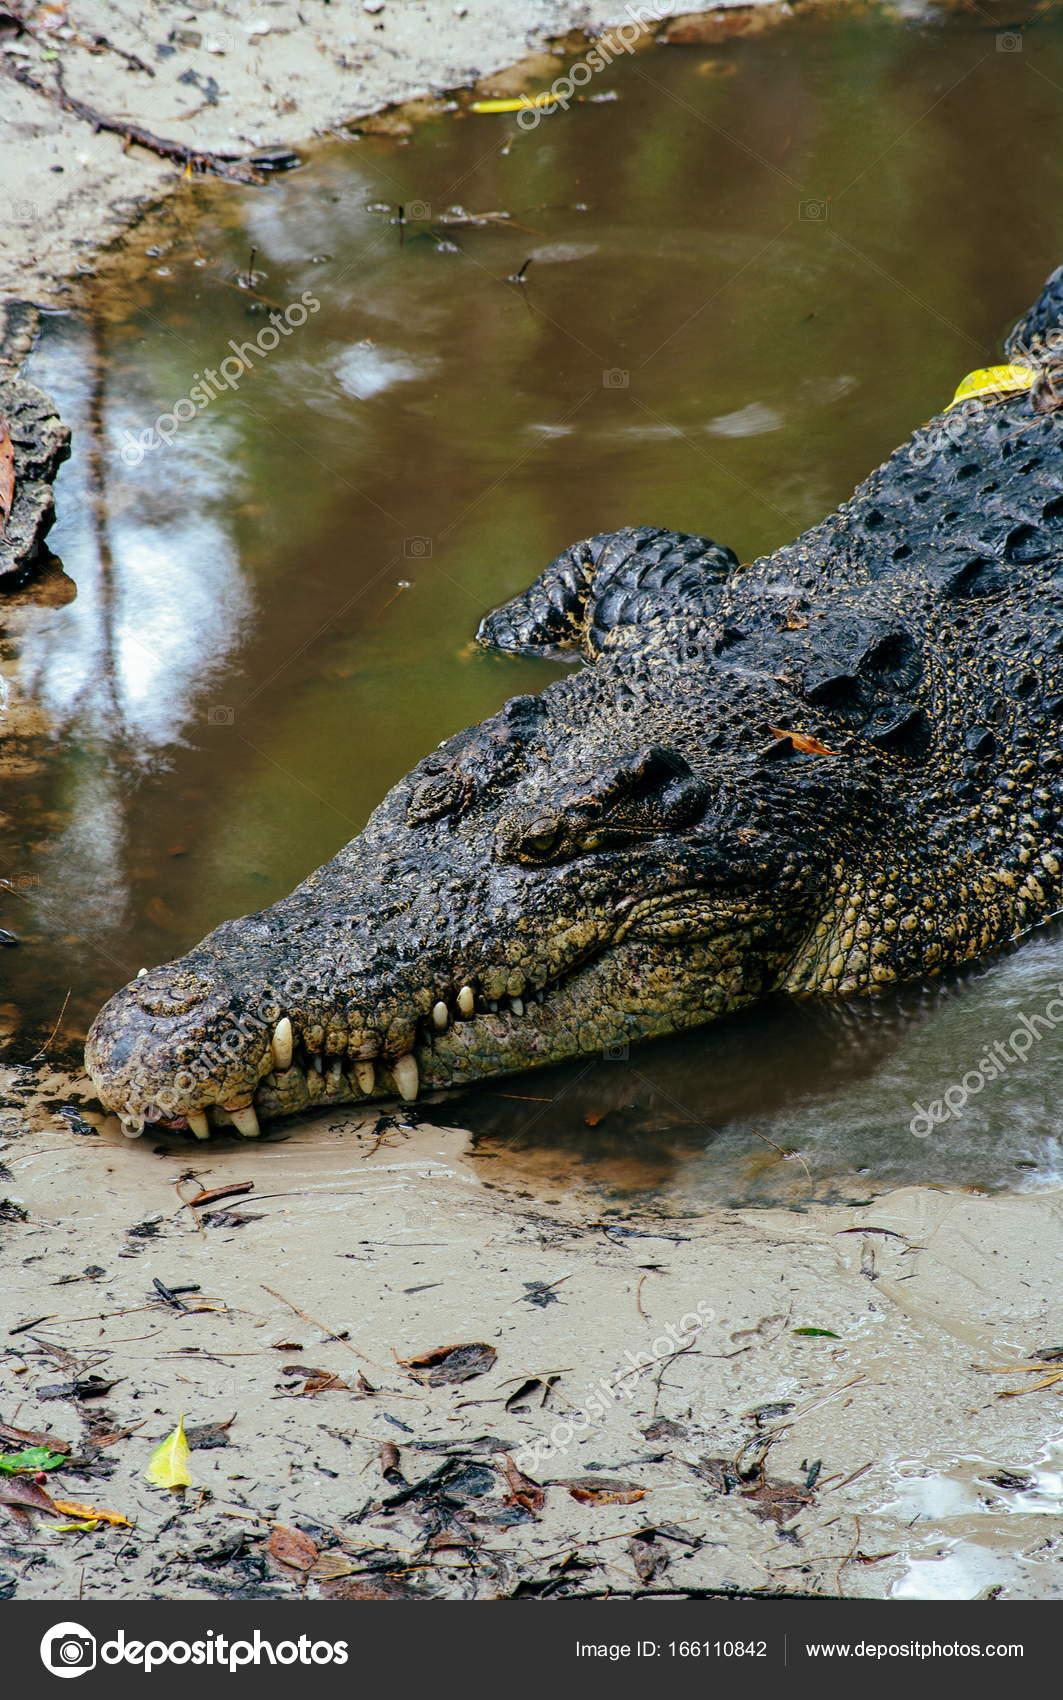 5df6ebebab4a Nile crocodile Crocodylus niloticus in the water